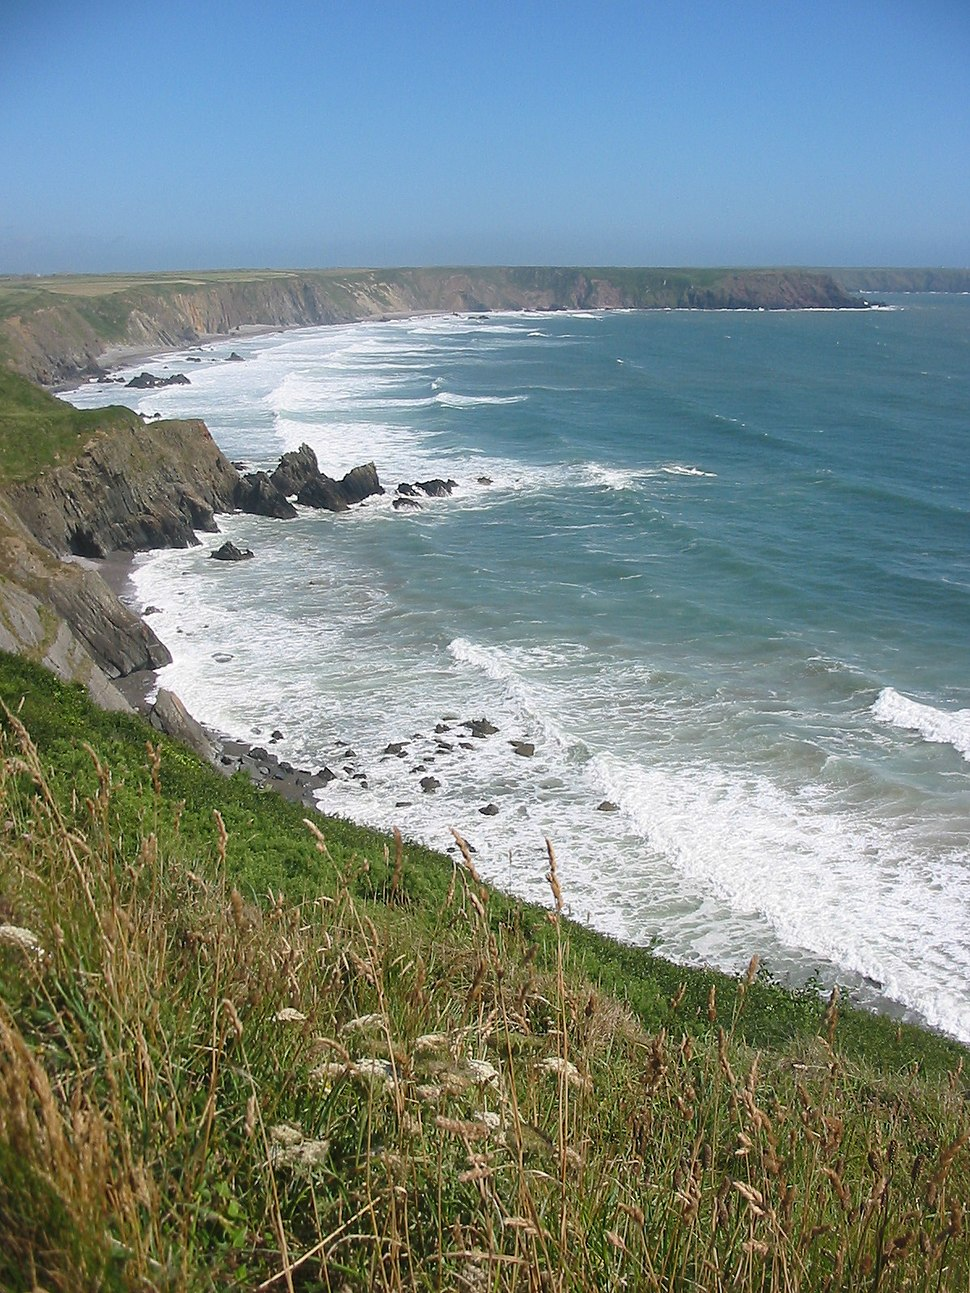 Marloes peninsula, Pembrokeshire coast, Wales, UK